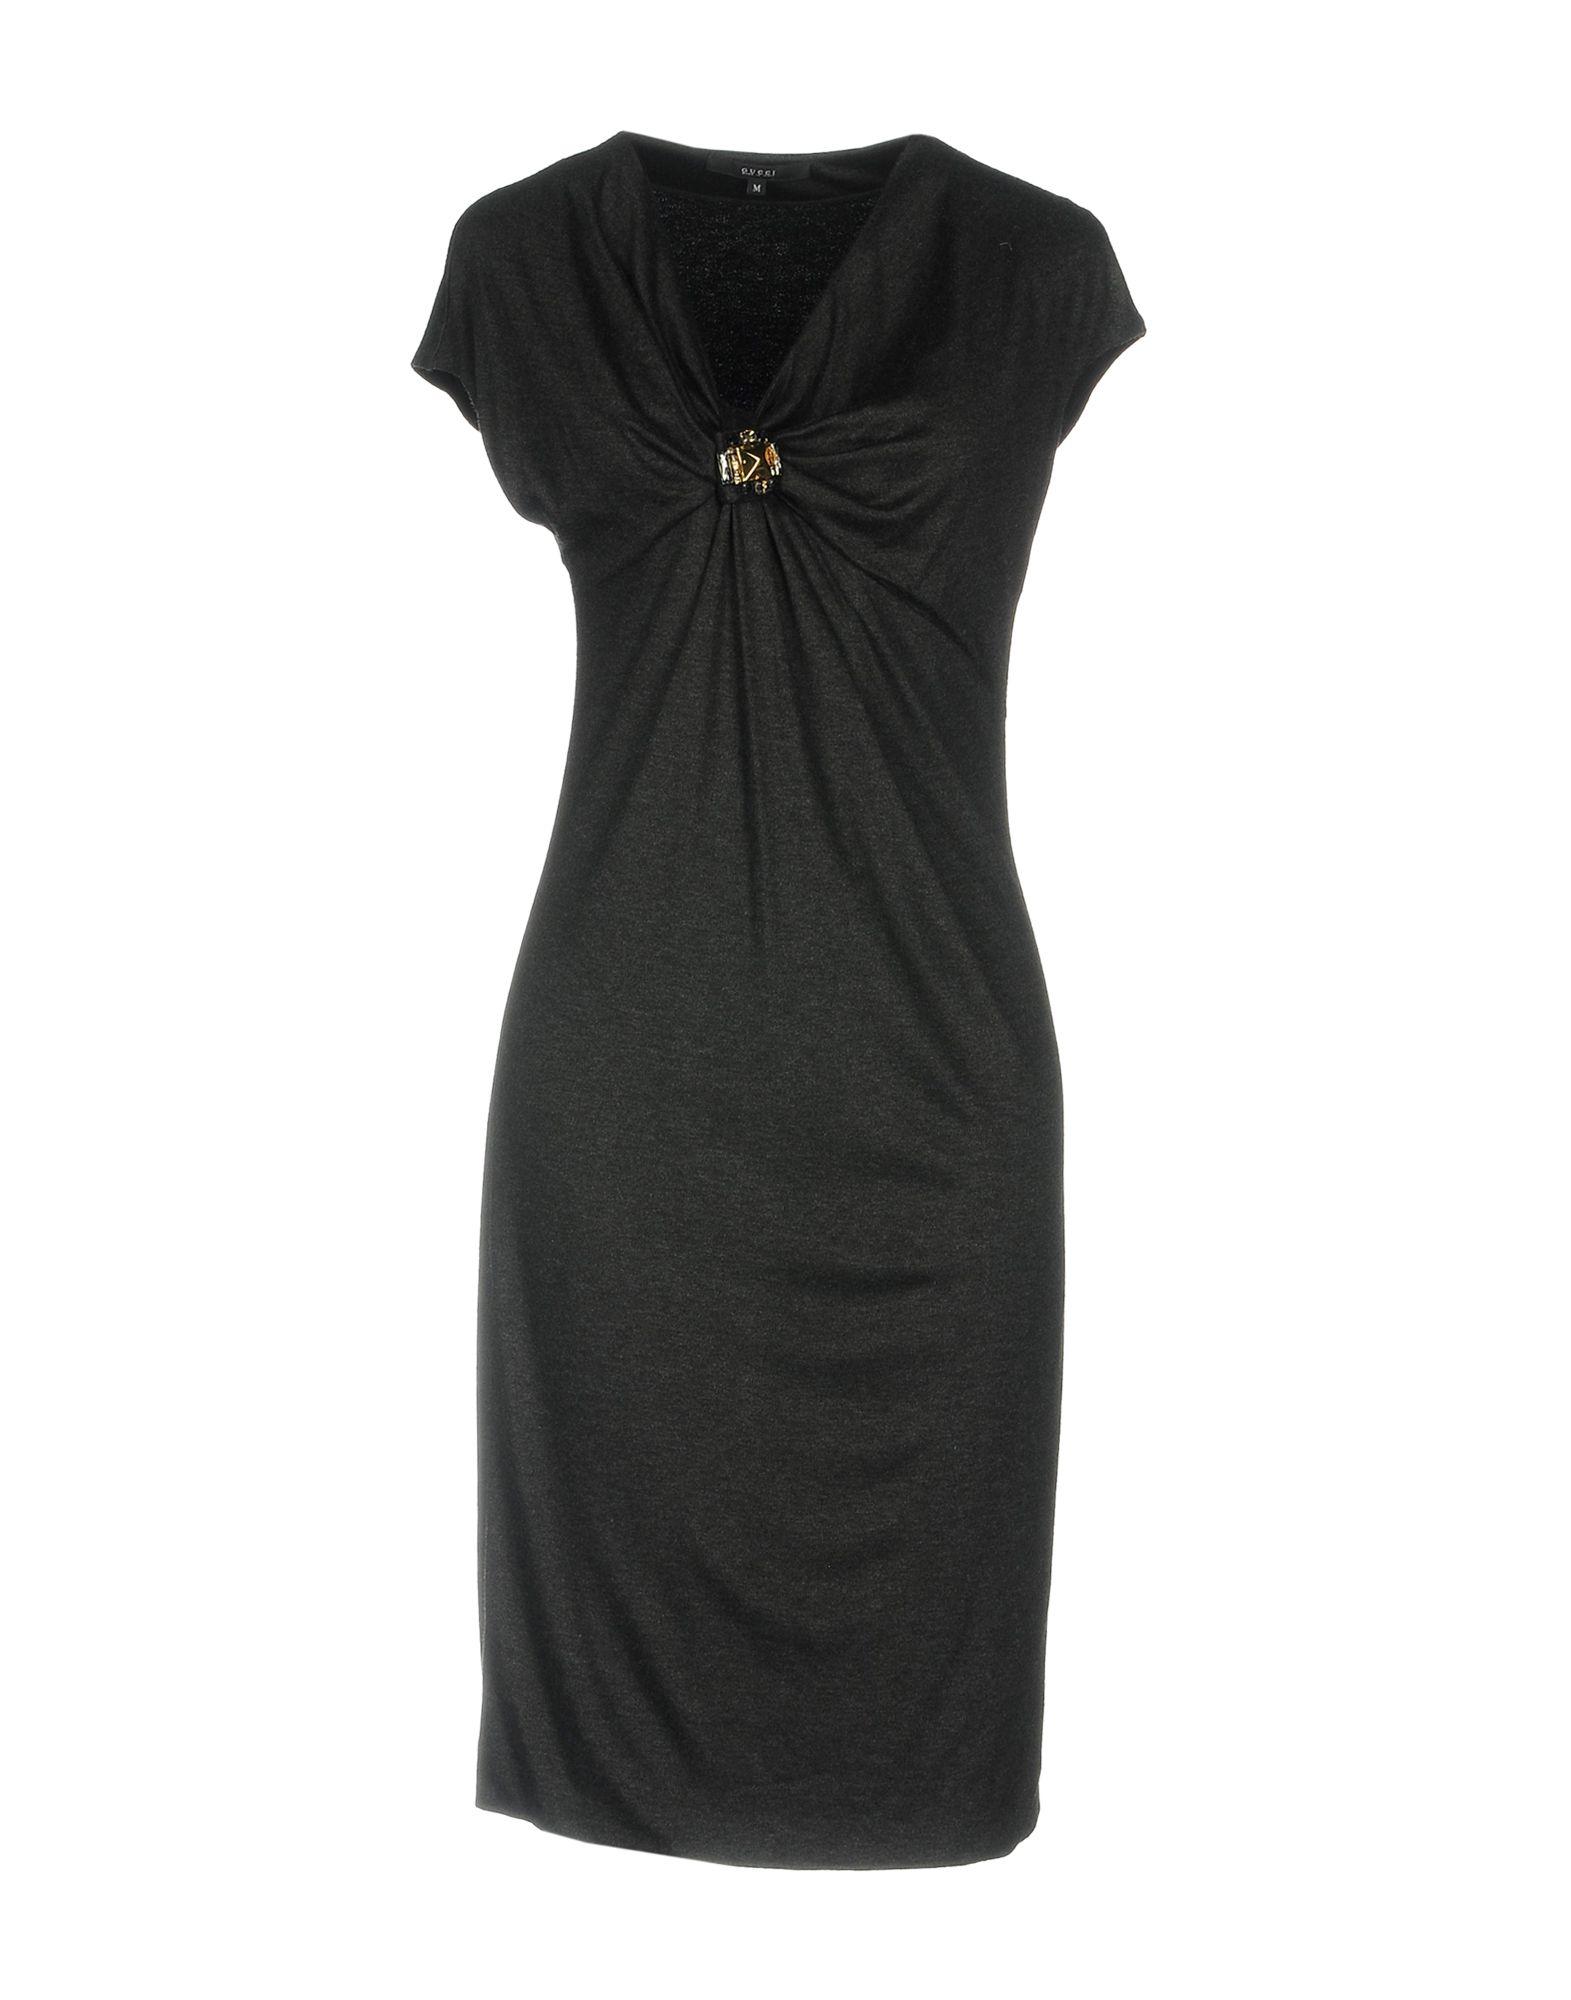 GUCCI Damen Knielanges Kleid Farbe Granitgrau Größe 5